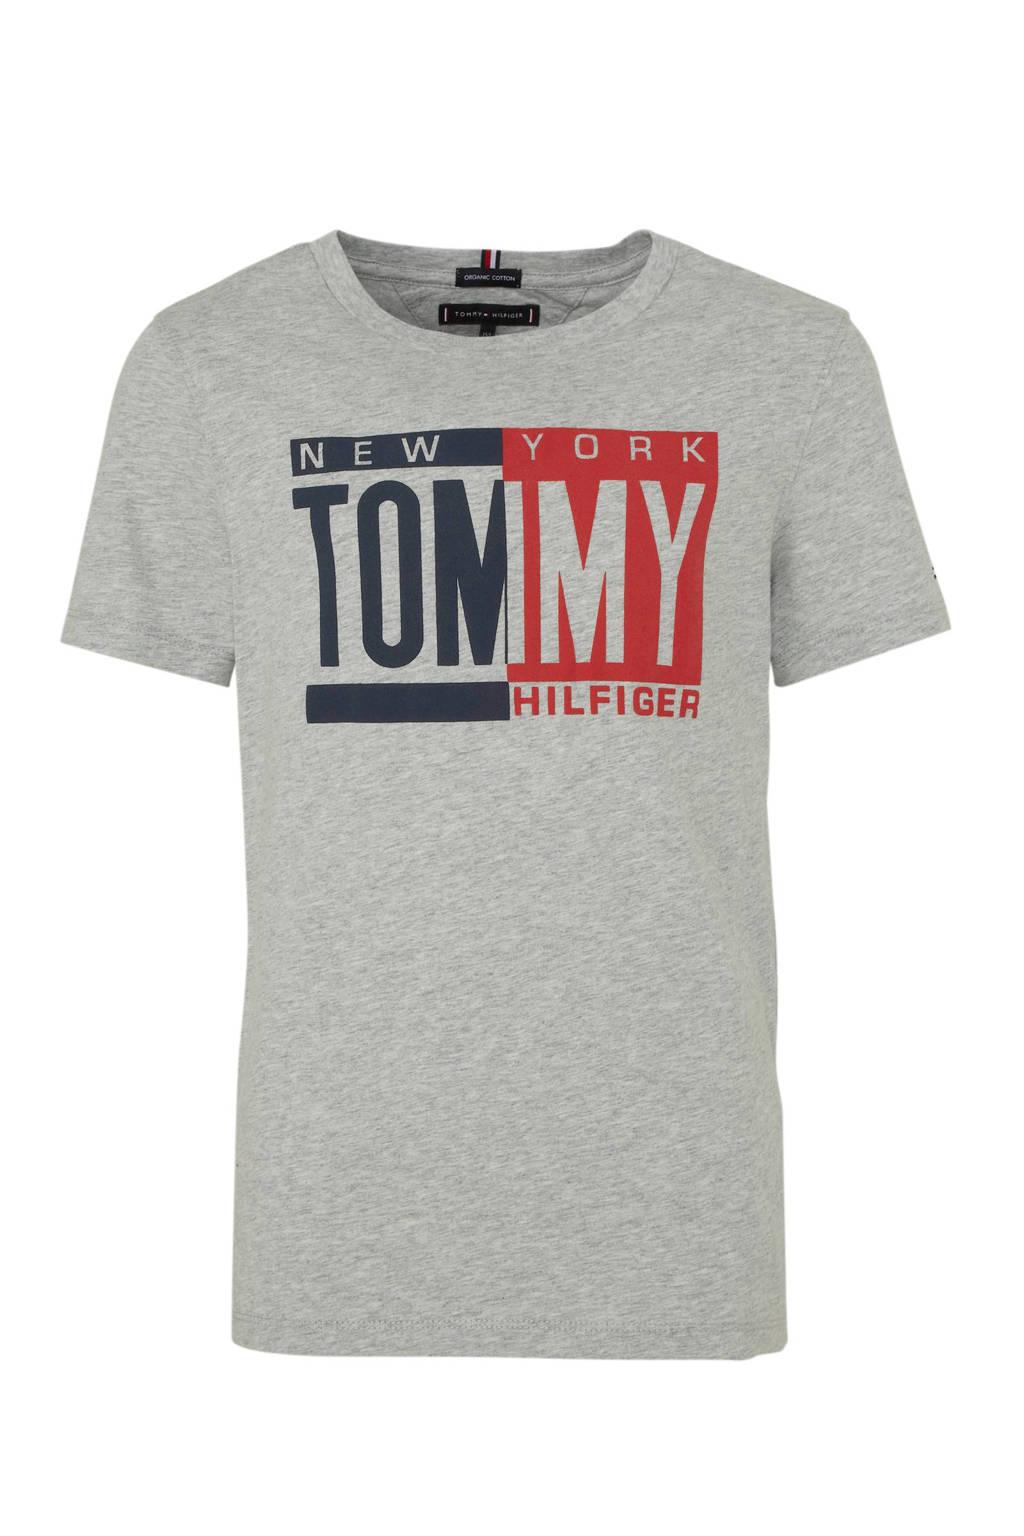 Tommy Hilfiger T-shirt met printopdruk grijs melange/rood/donkerblauw, Grijs melange/rood/donkerblauw